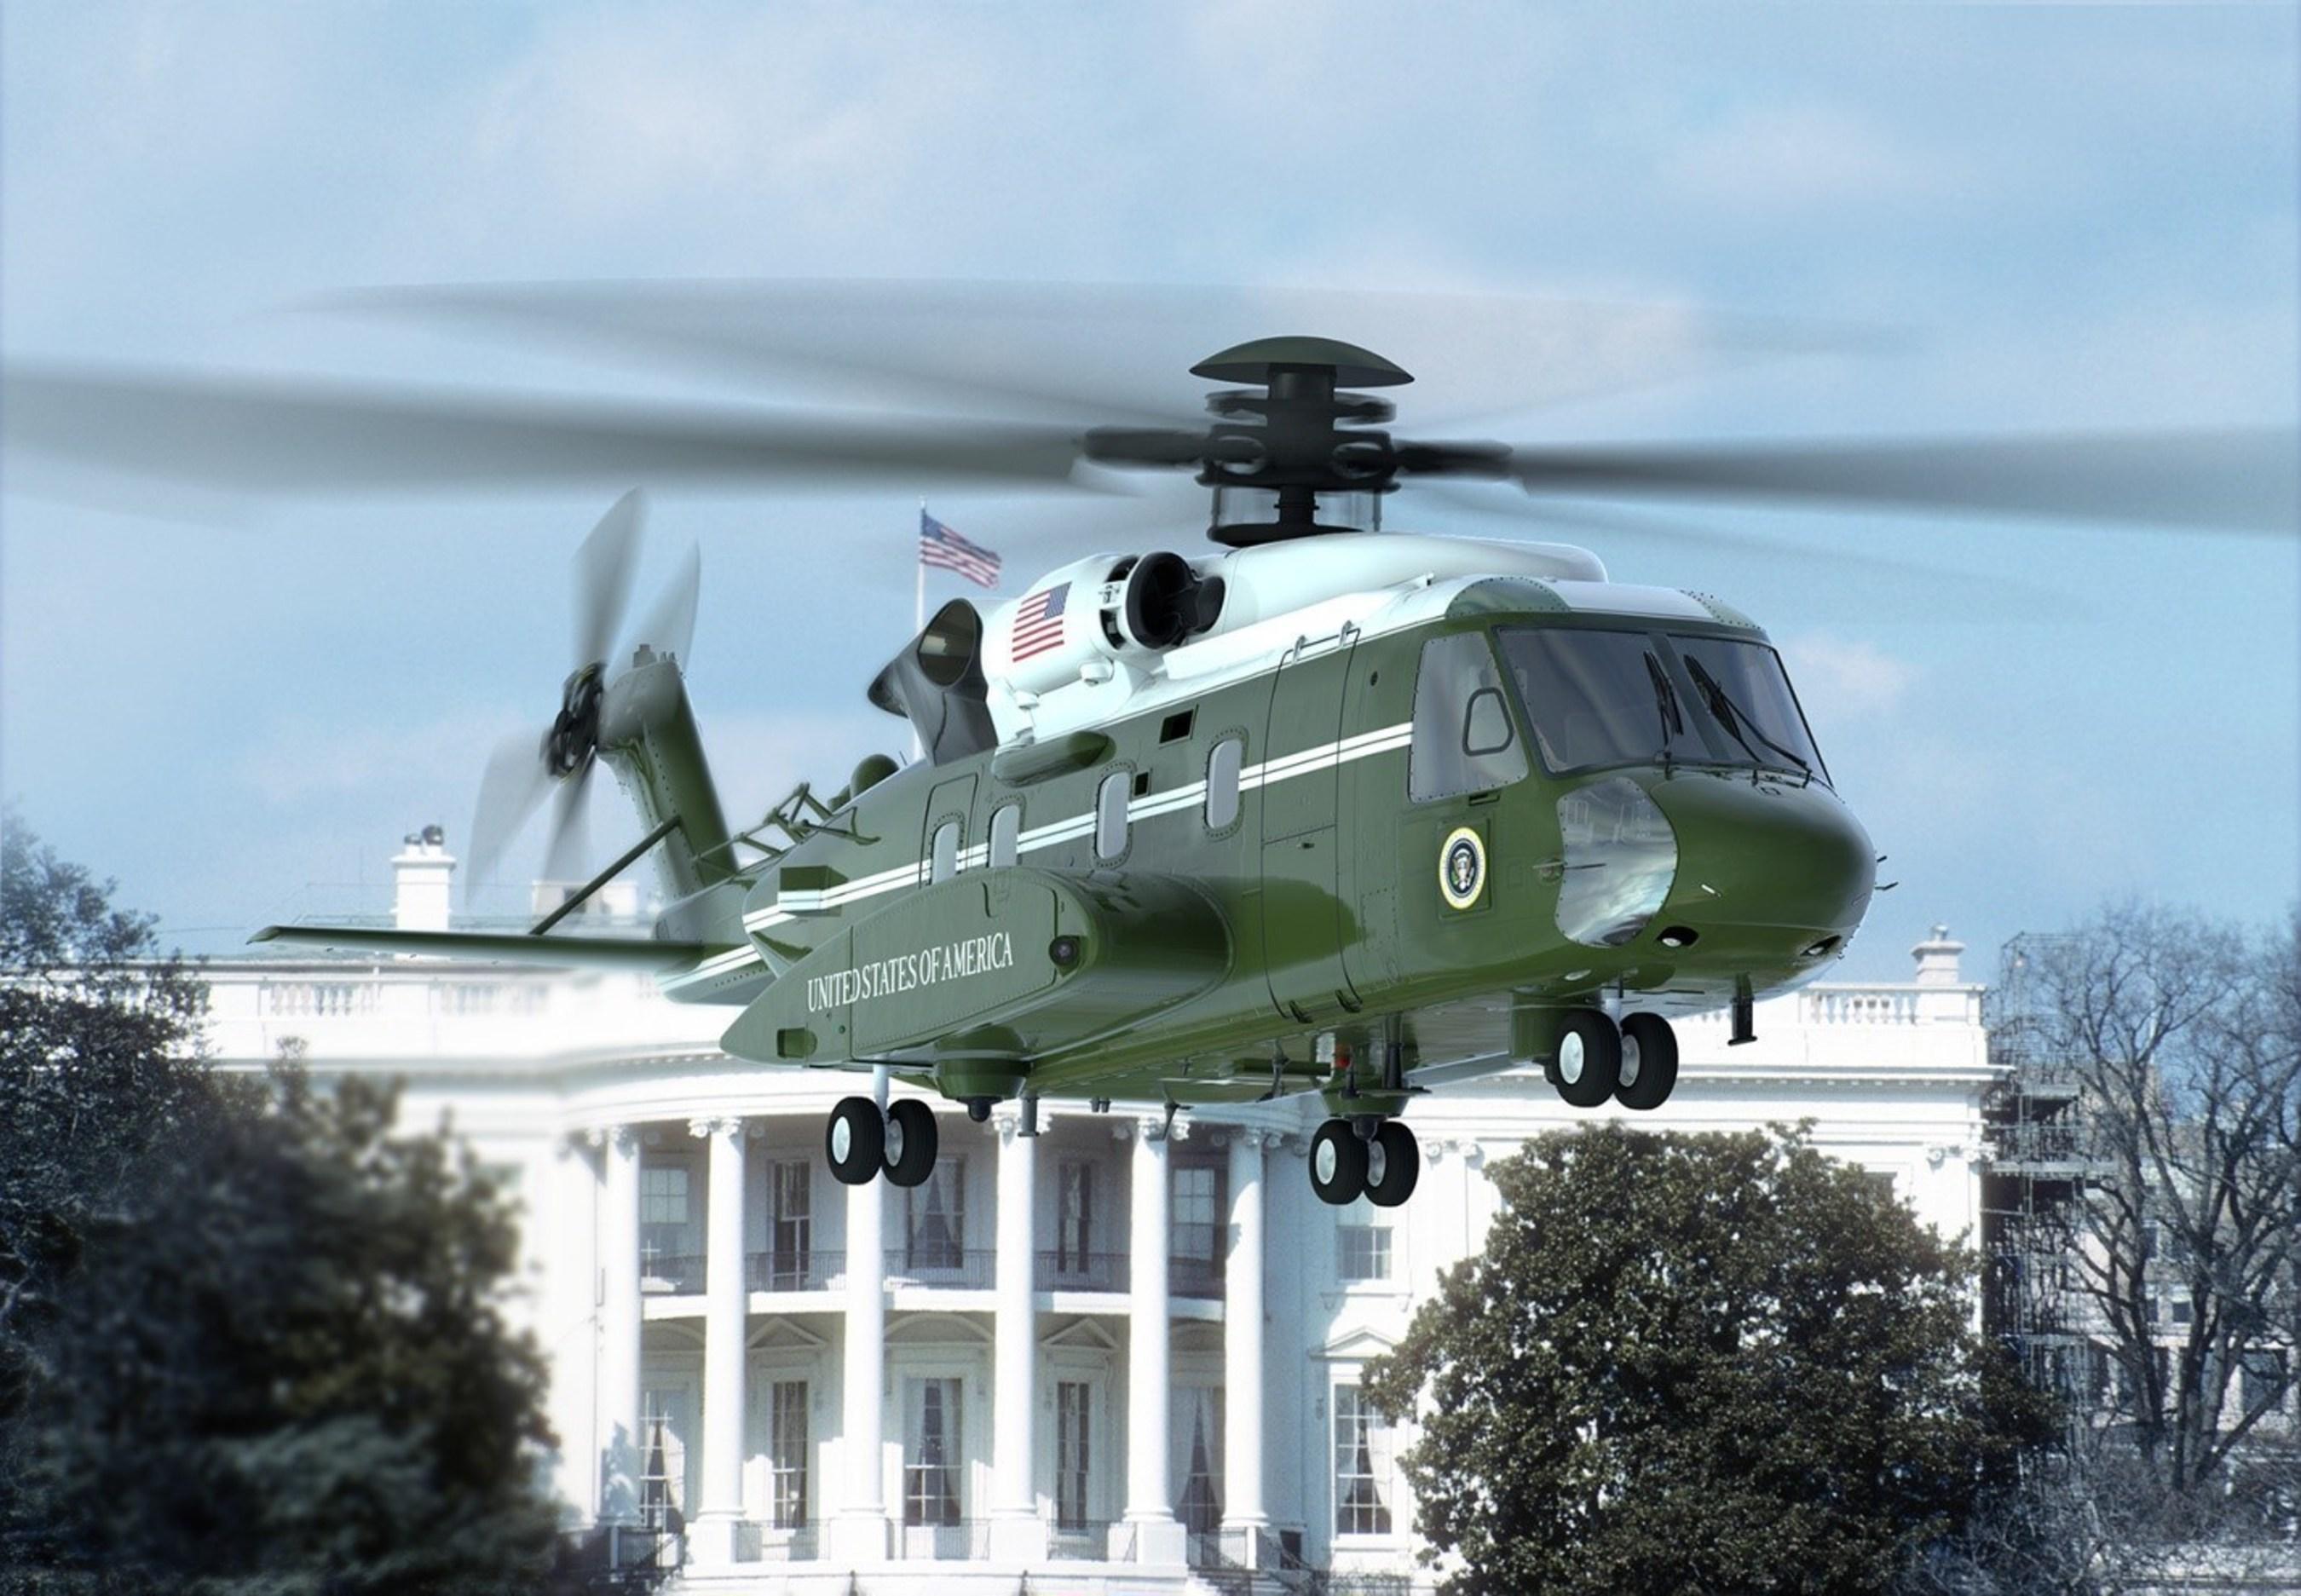 An artist rendering of the VH-92A aircraft.